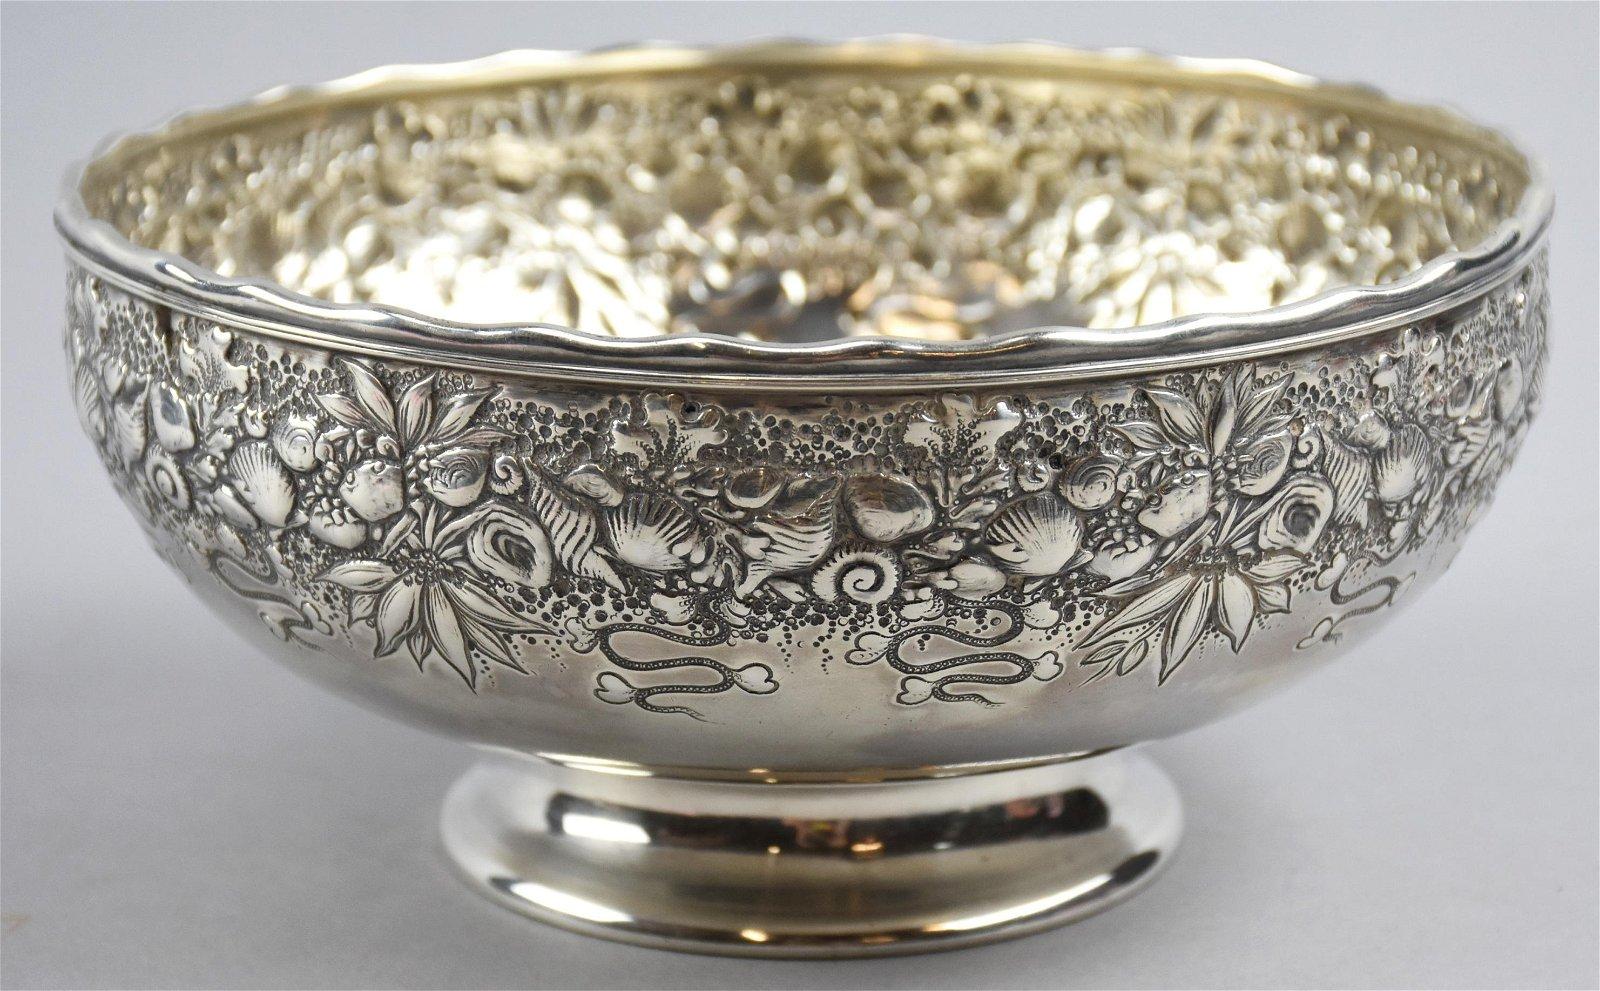 Antique Gorham Sterling Silver Repousse Bowl